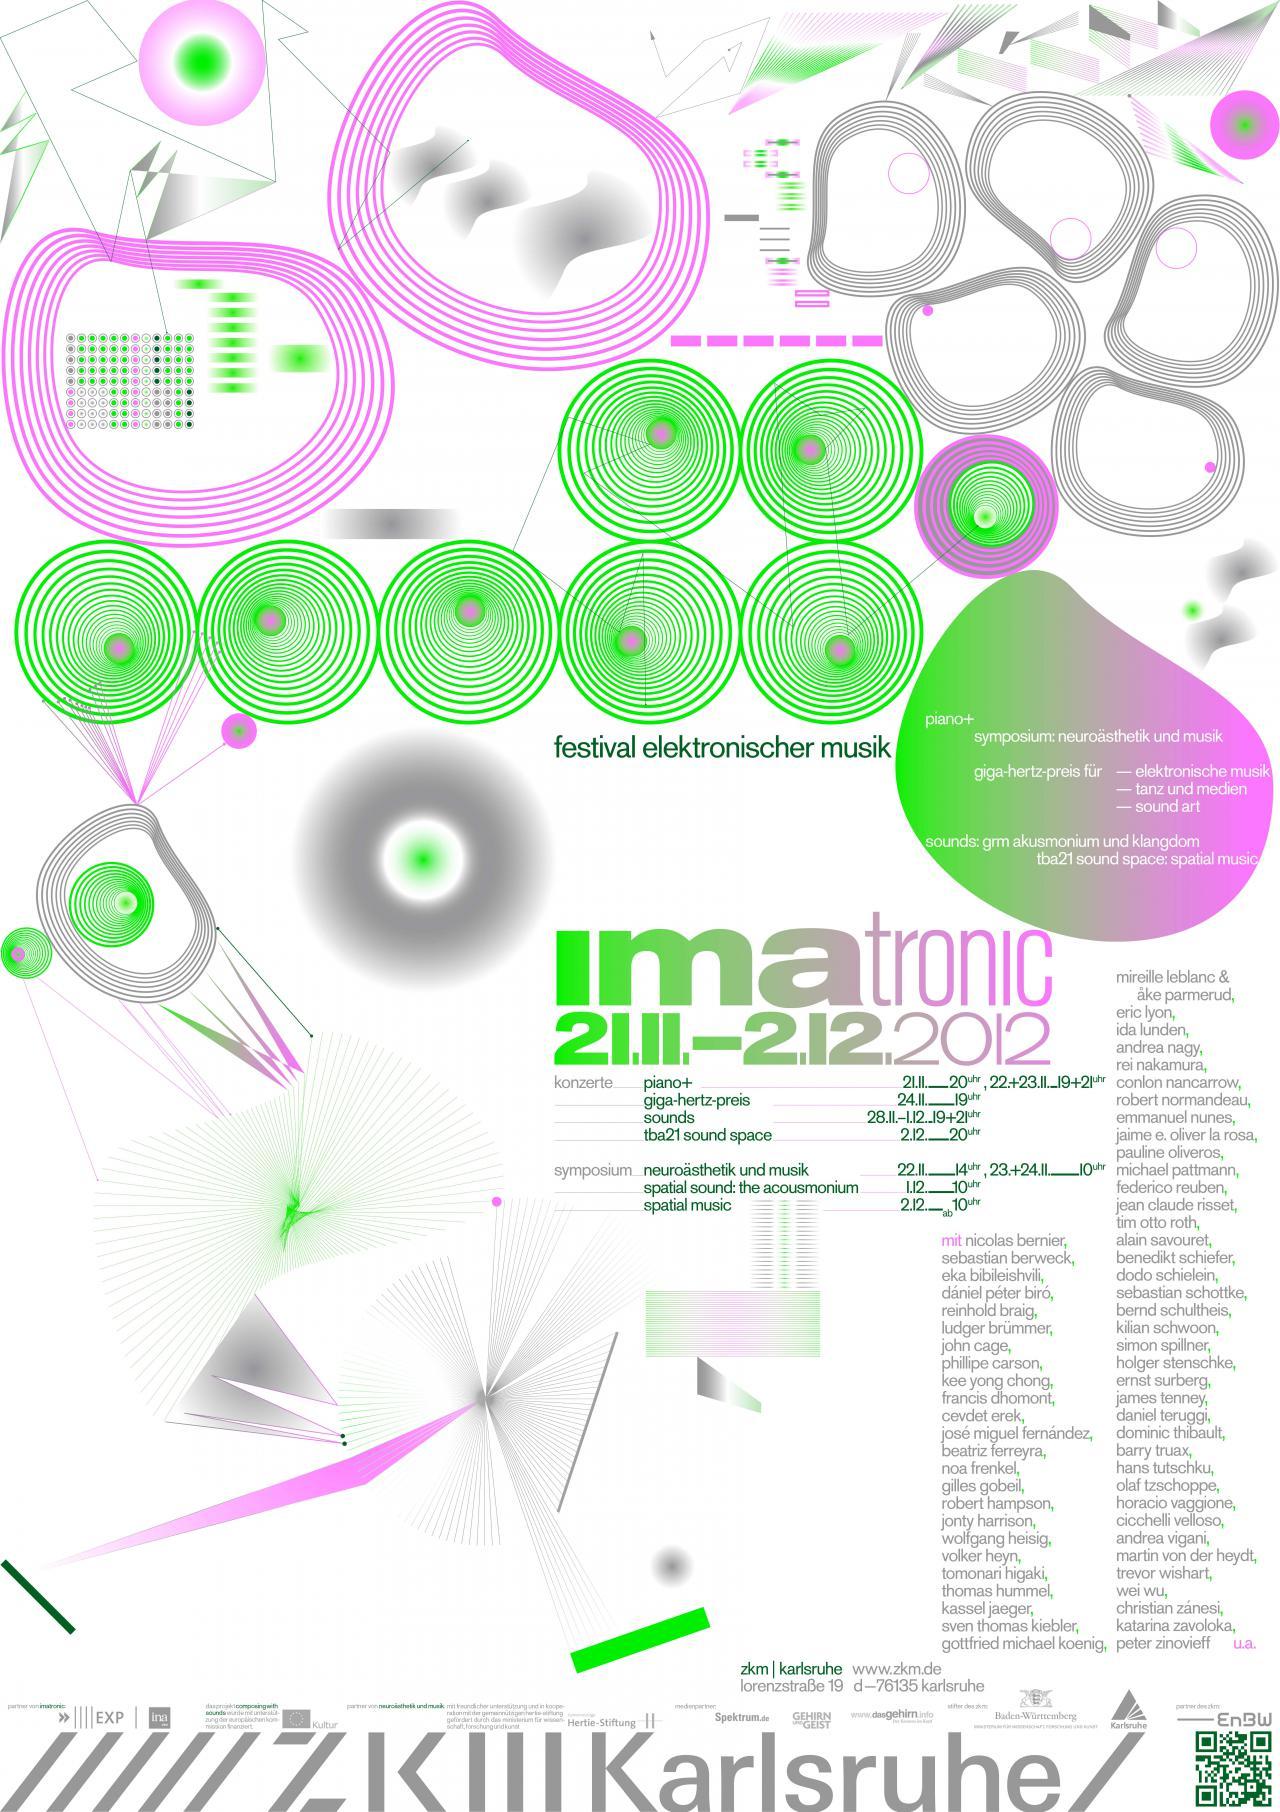 Poster IMATRONIC 2012 at ZKM | Karlsruhe